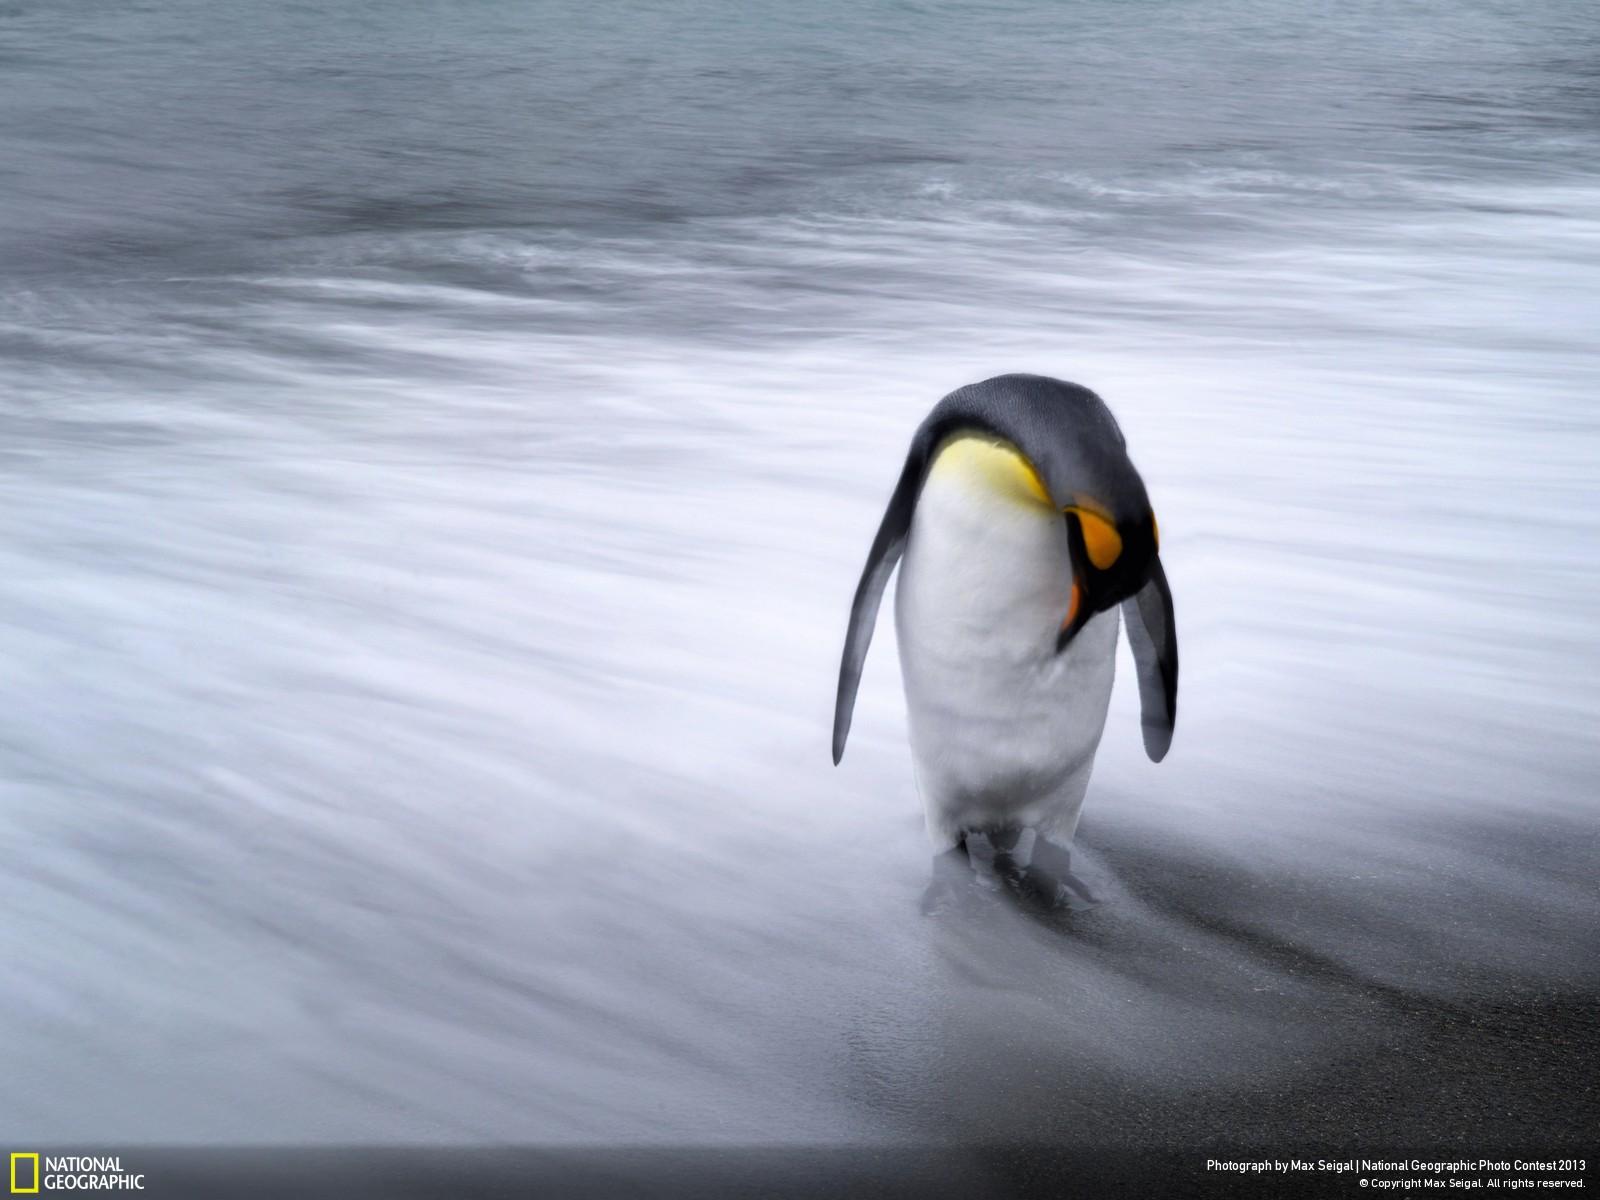 National Geographic best photos las mejores fotos del 2013 (4)